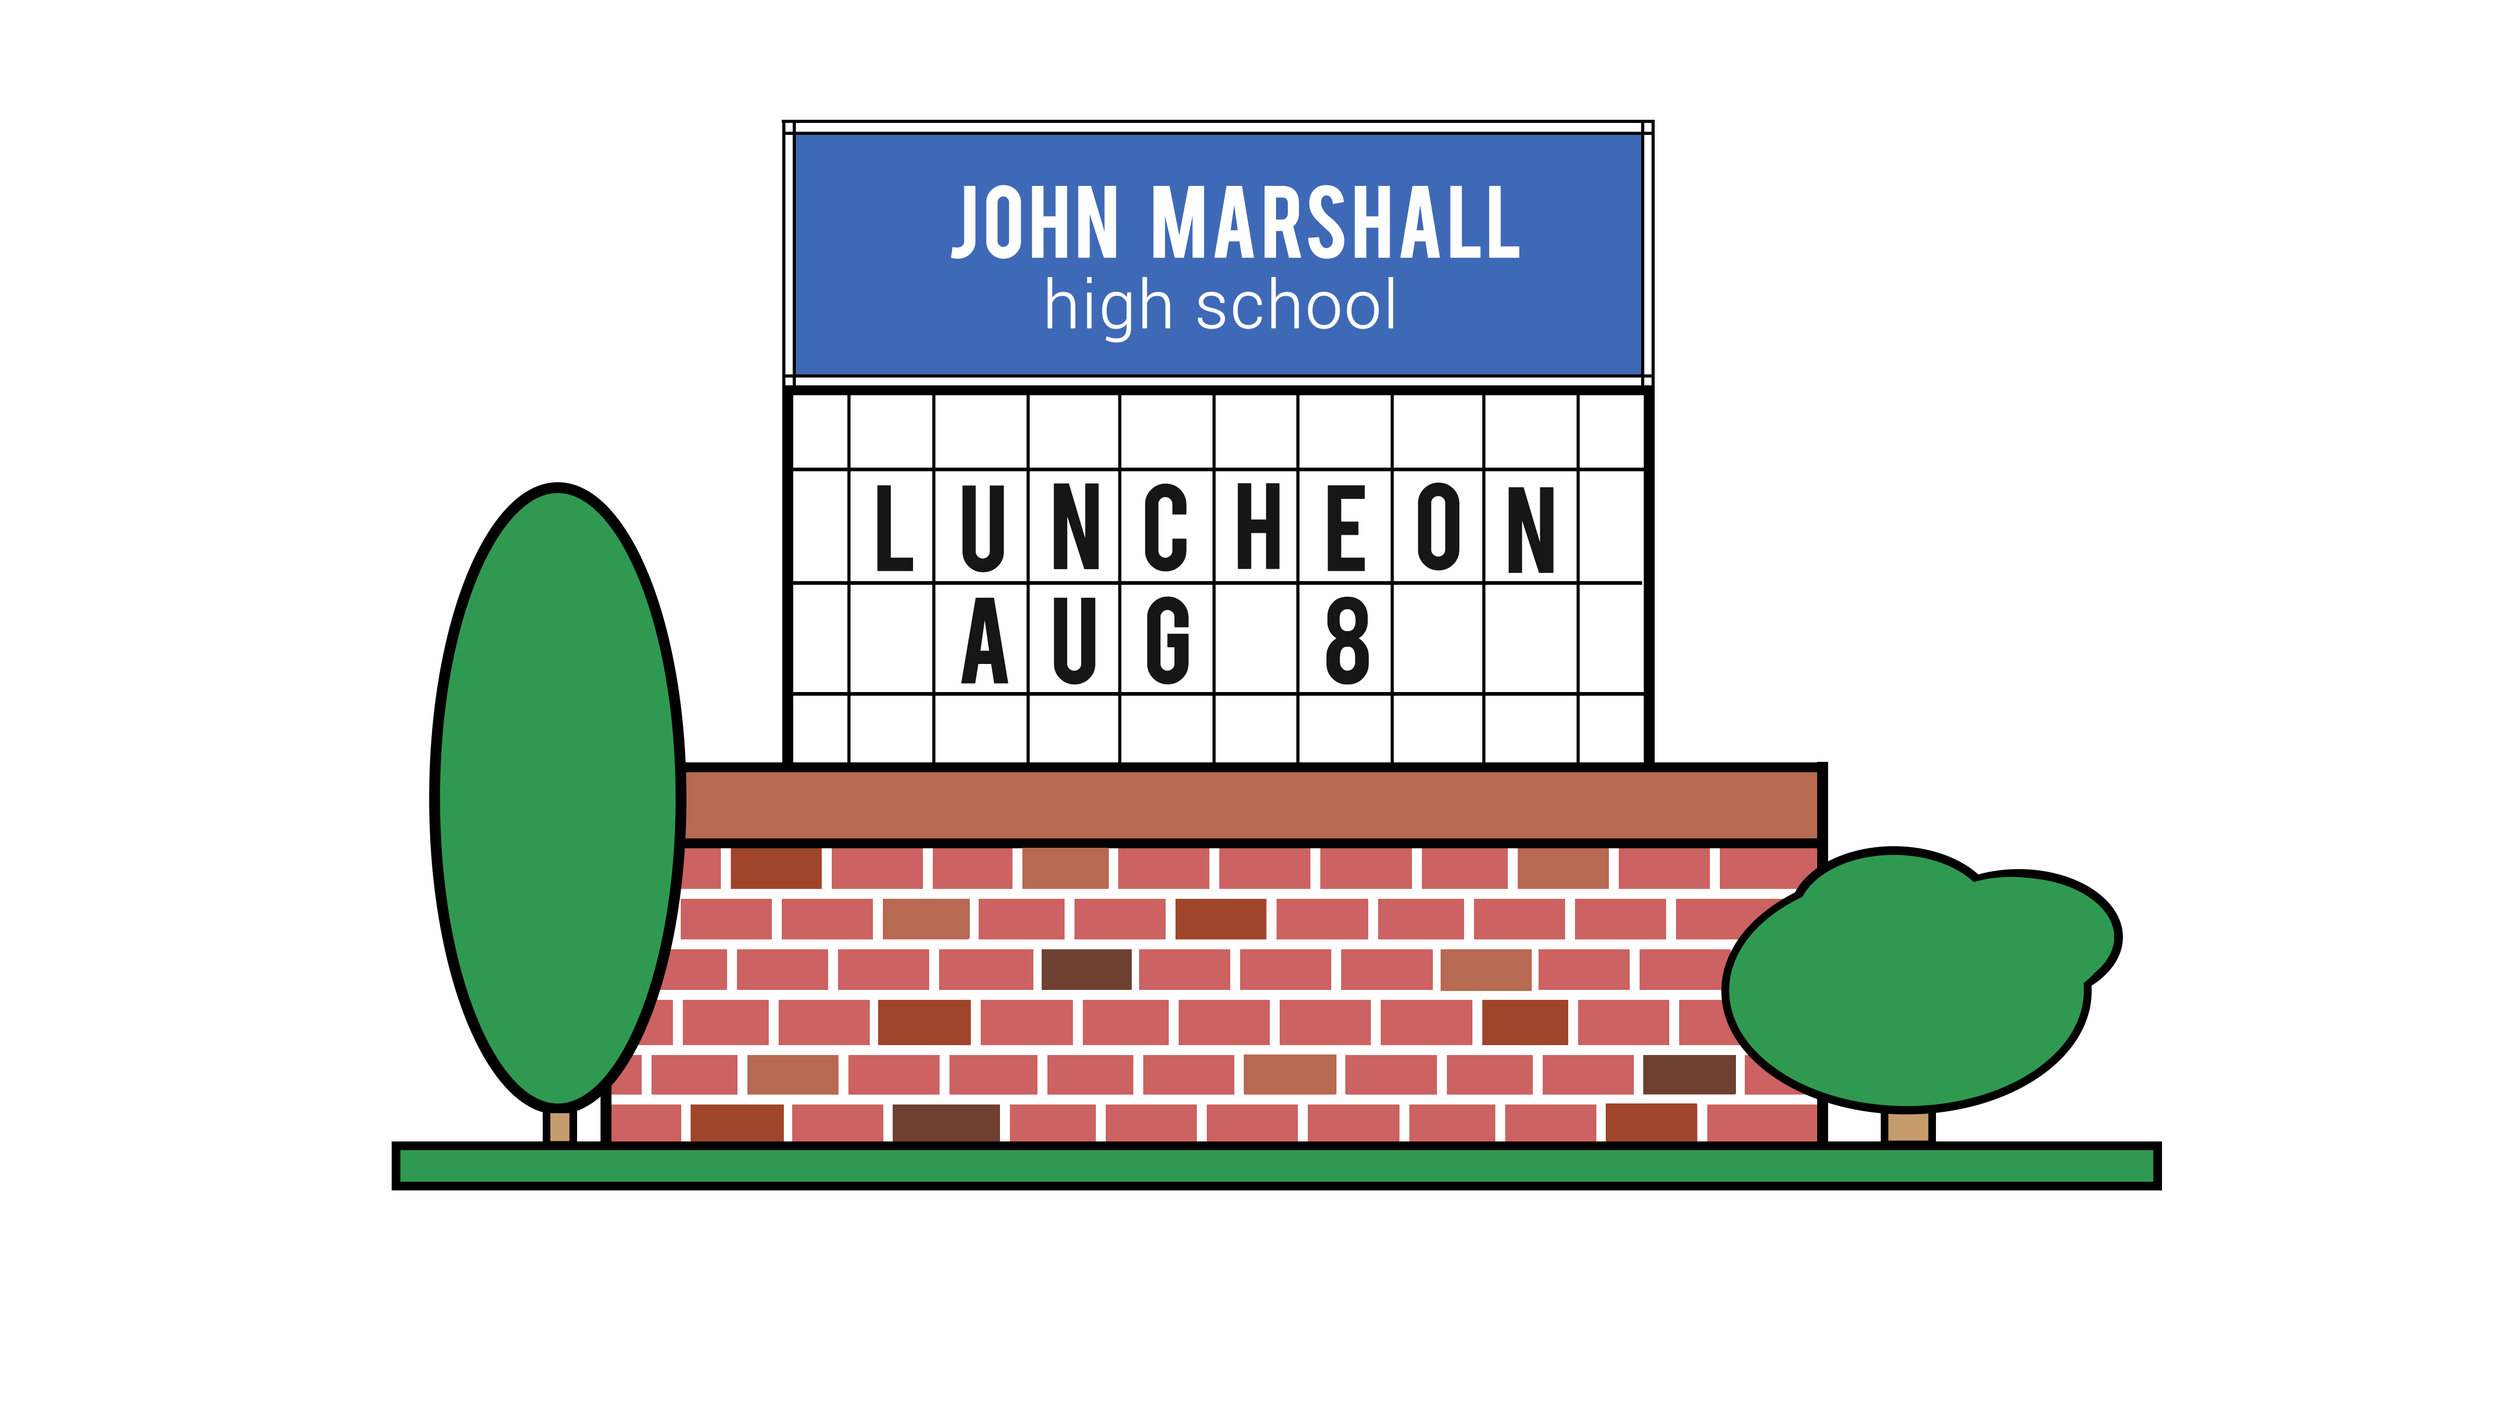 John Marshall Luncheon WEB.jpg